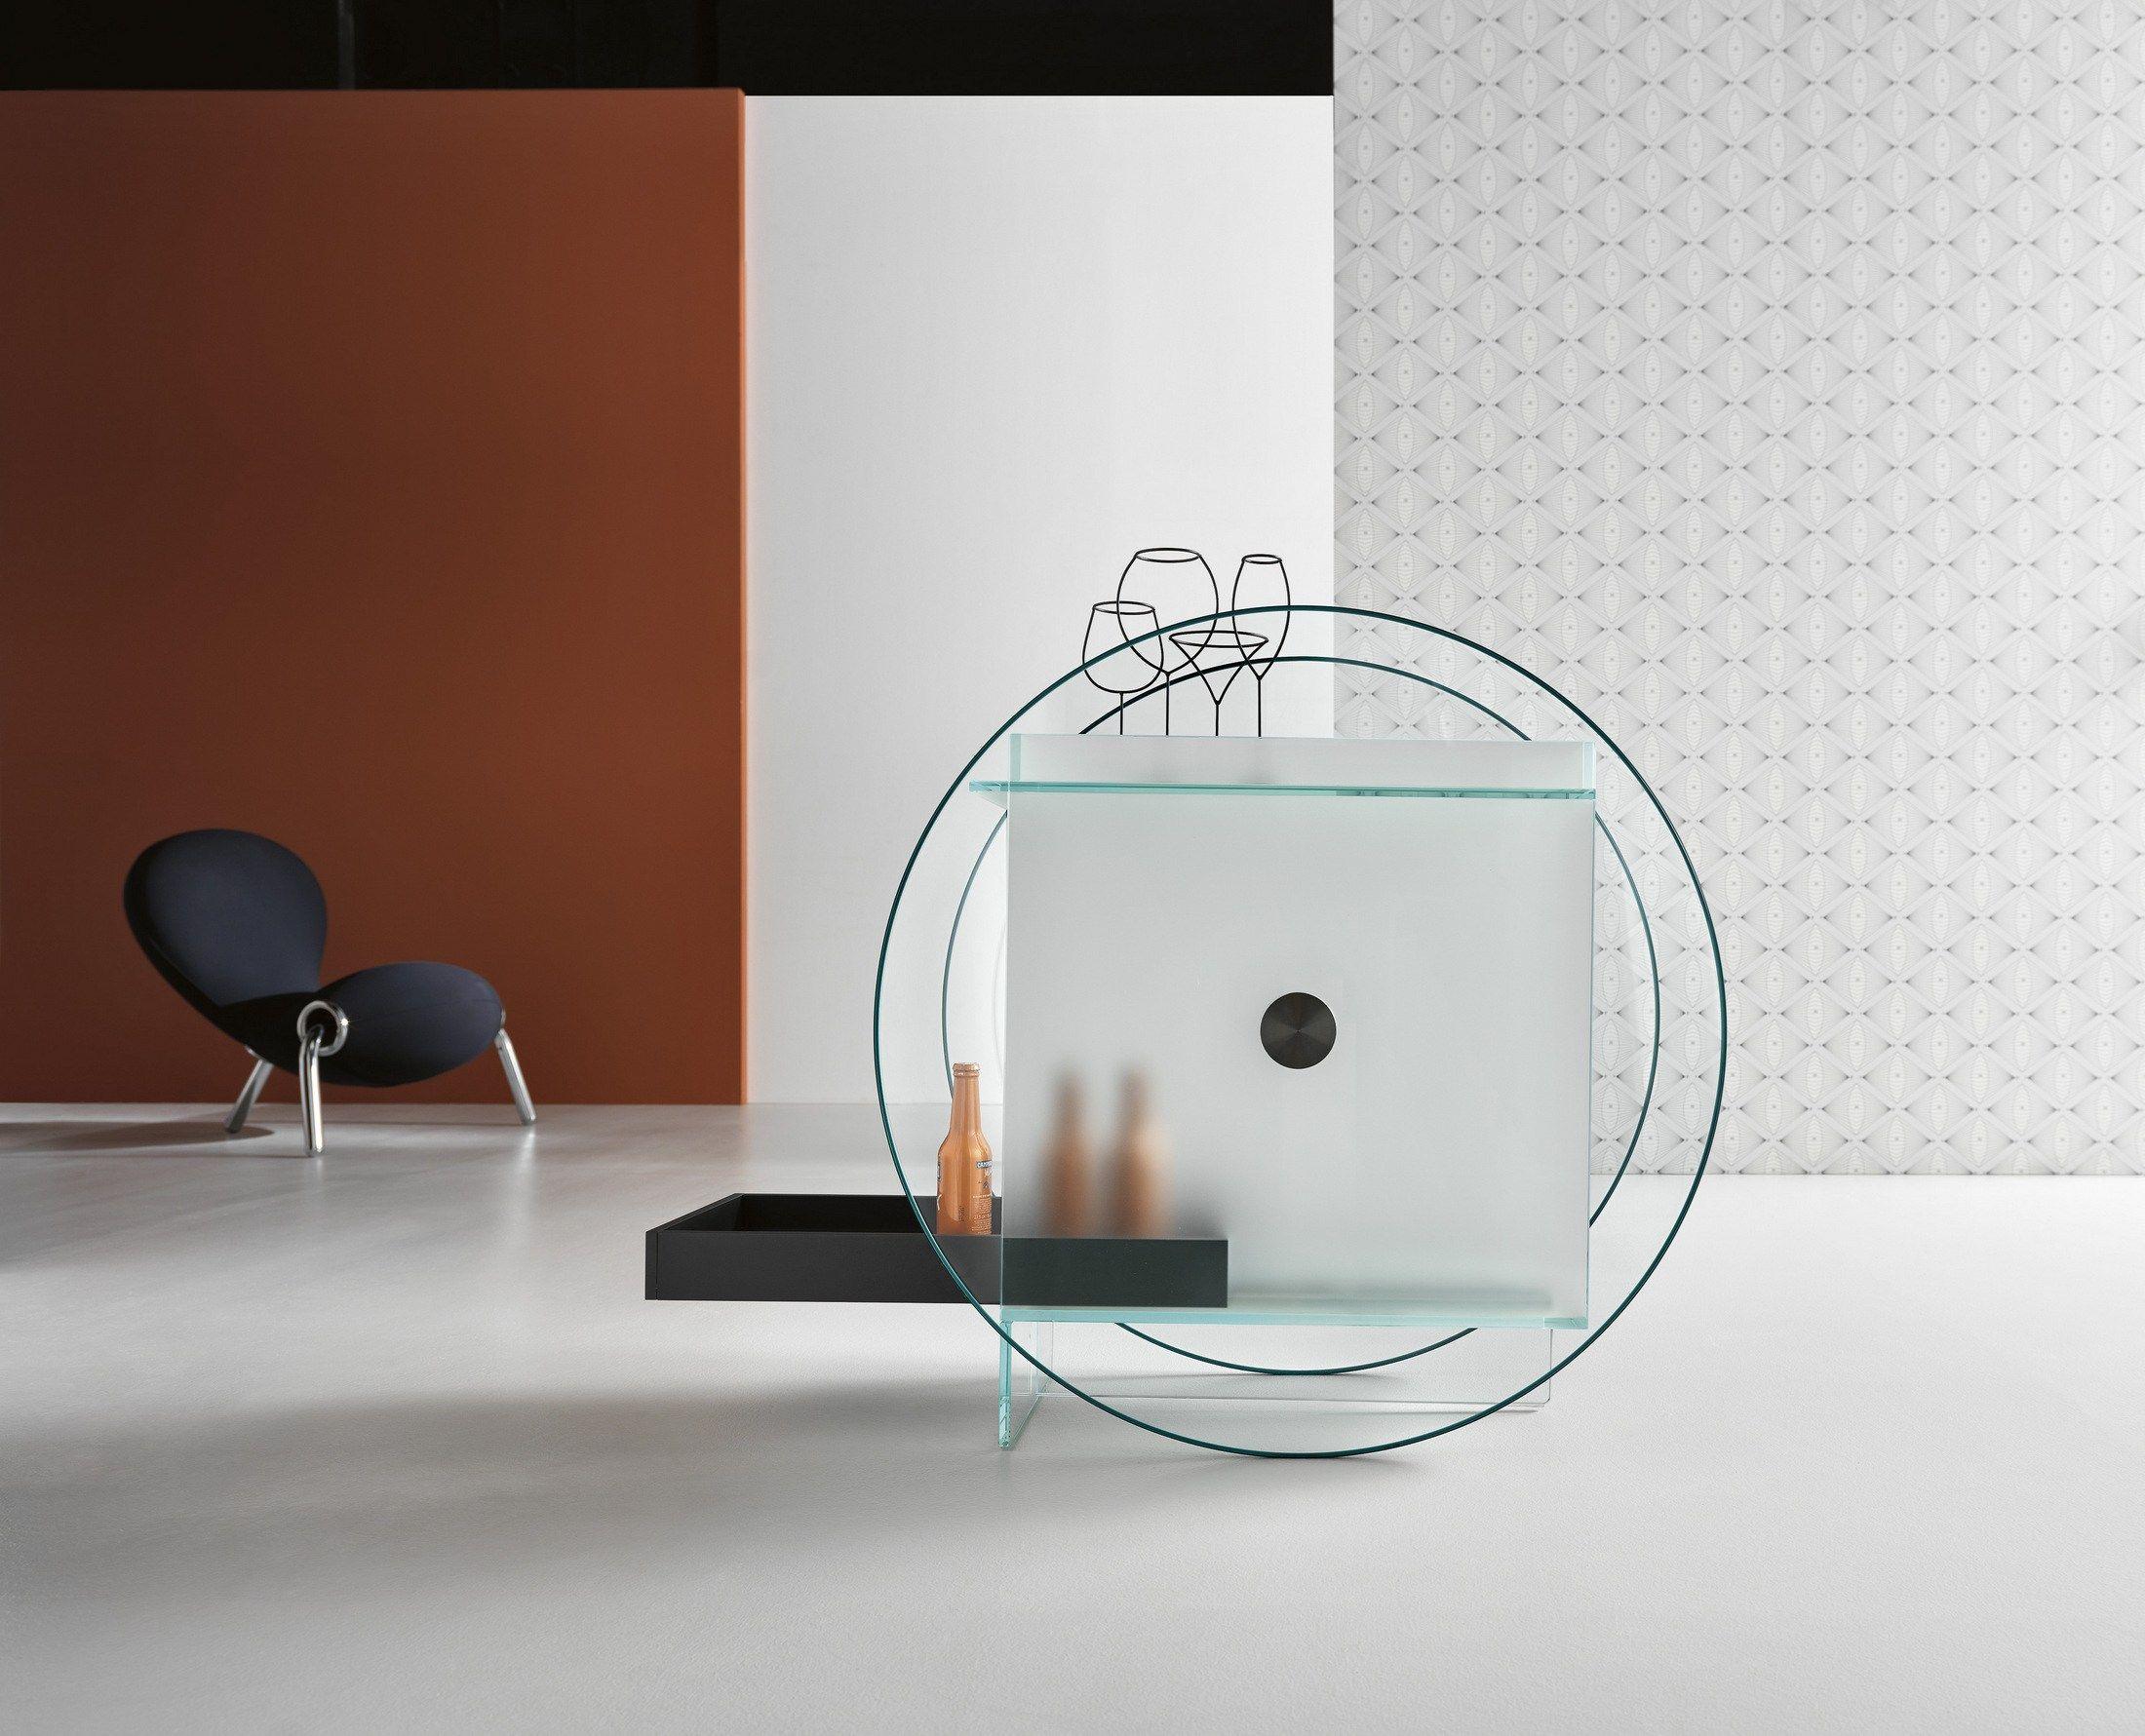 Mueble bar de vidrio KART by TD Tonelli Design diseño Karim Rashid